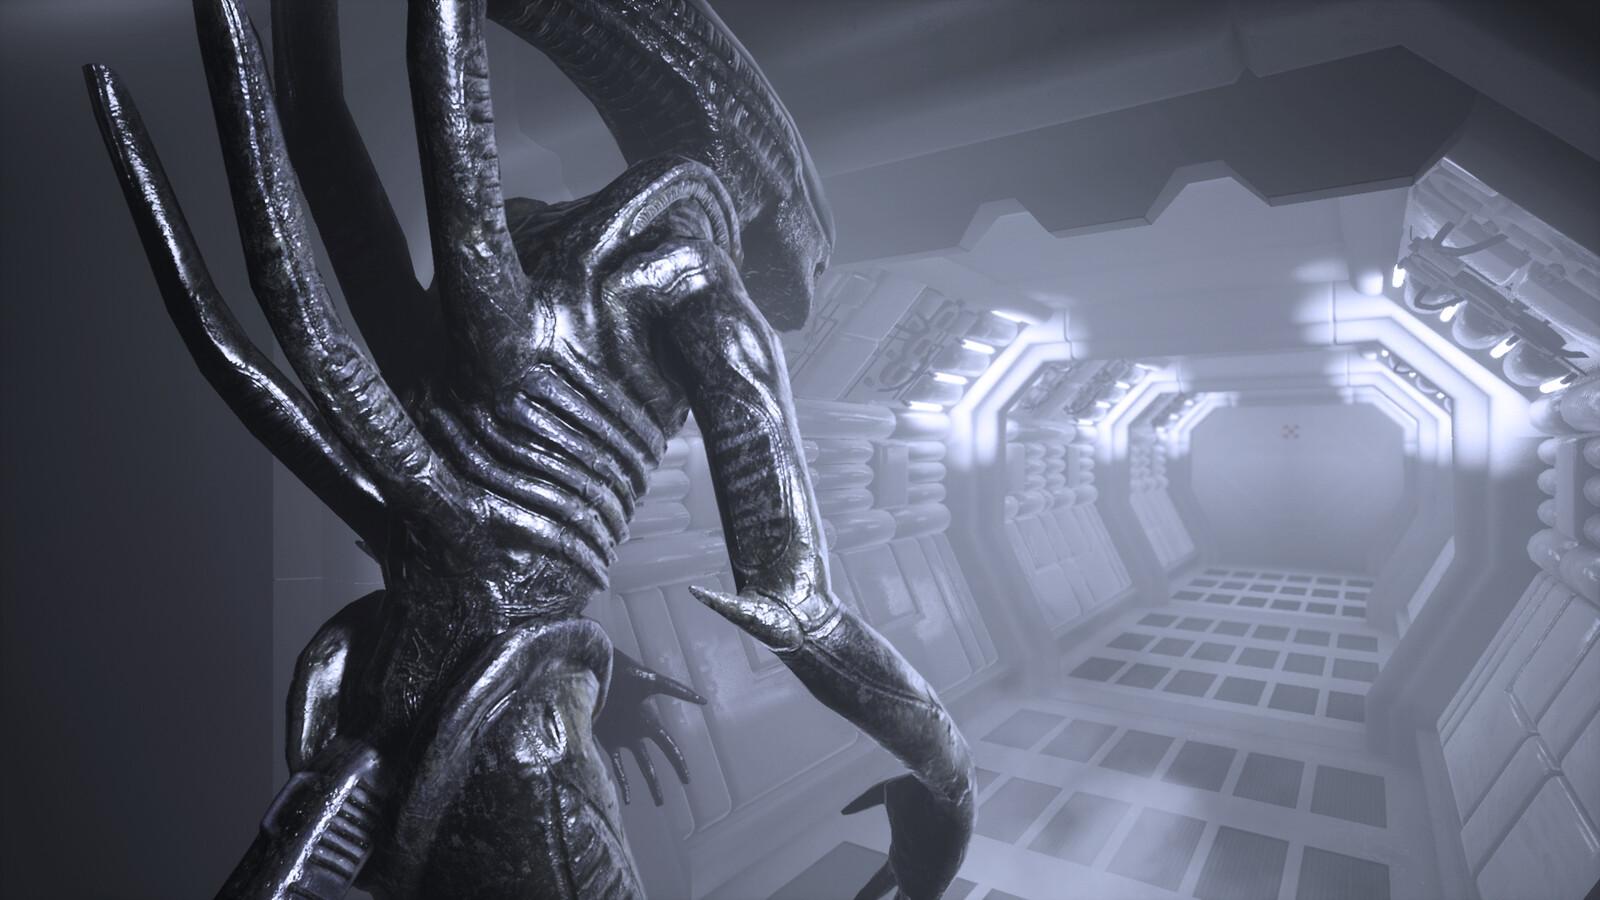 Alien Xenomorph - Unreal Engine 4